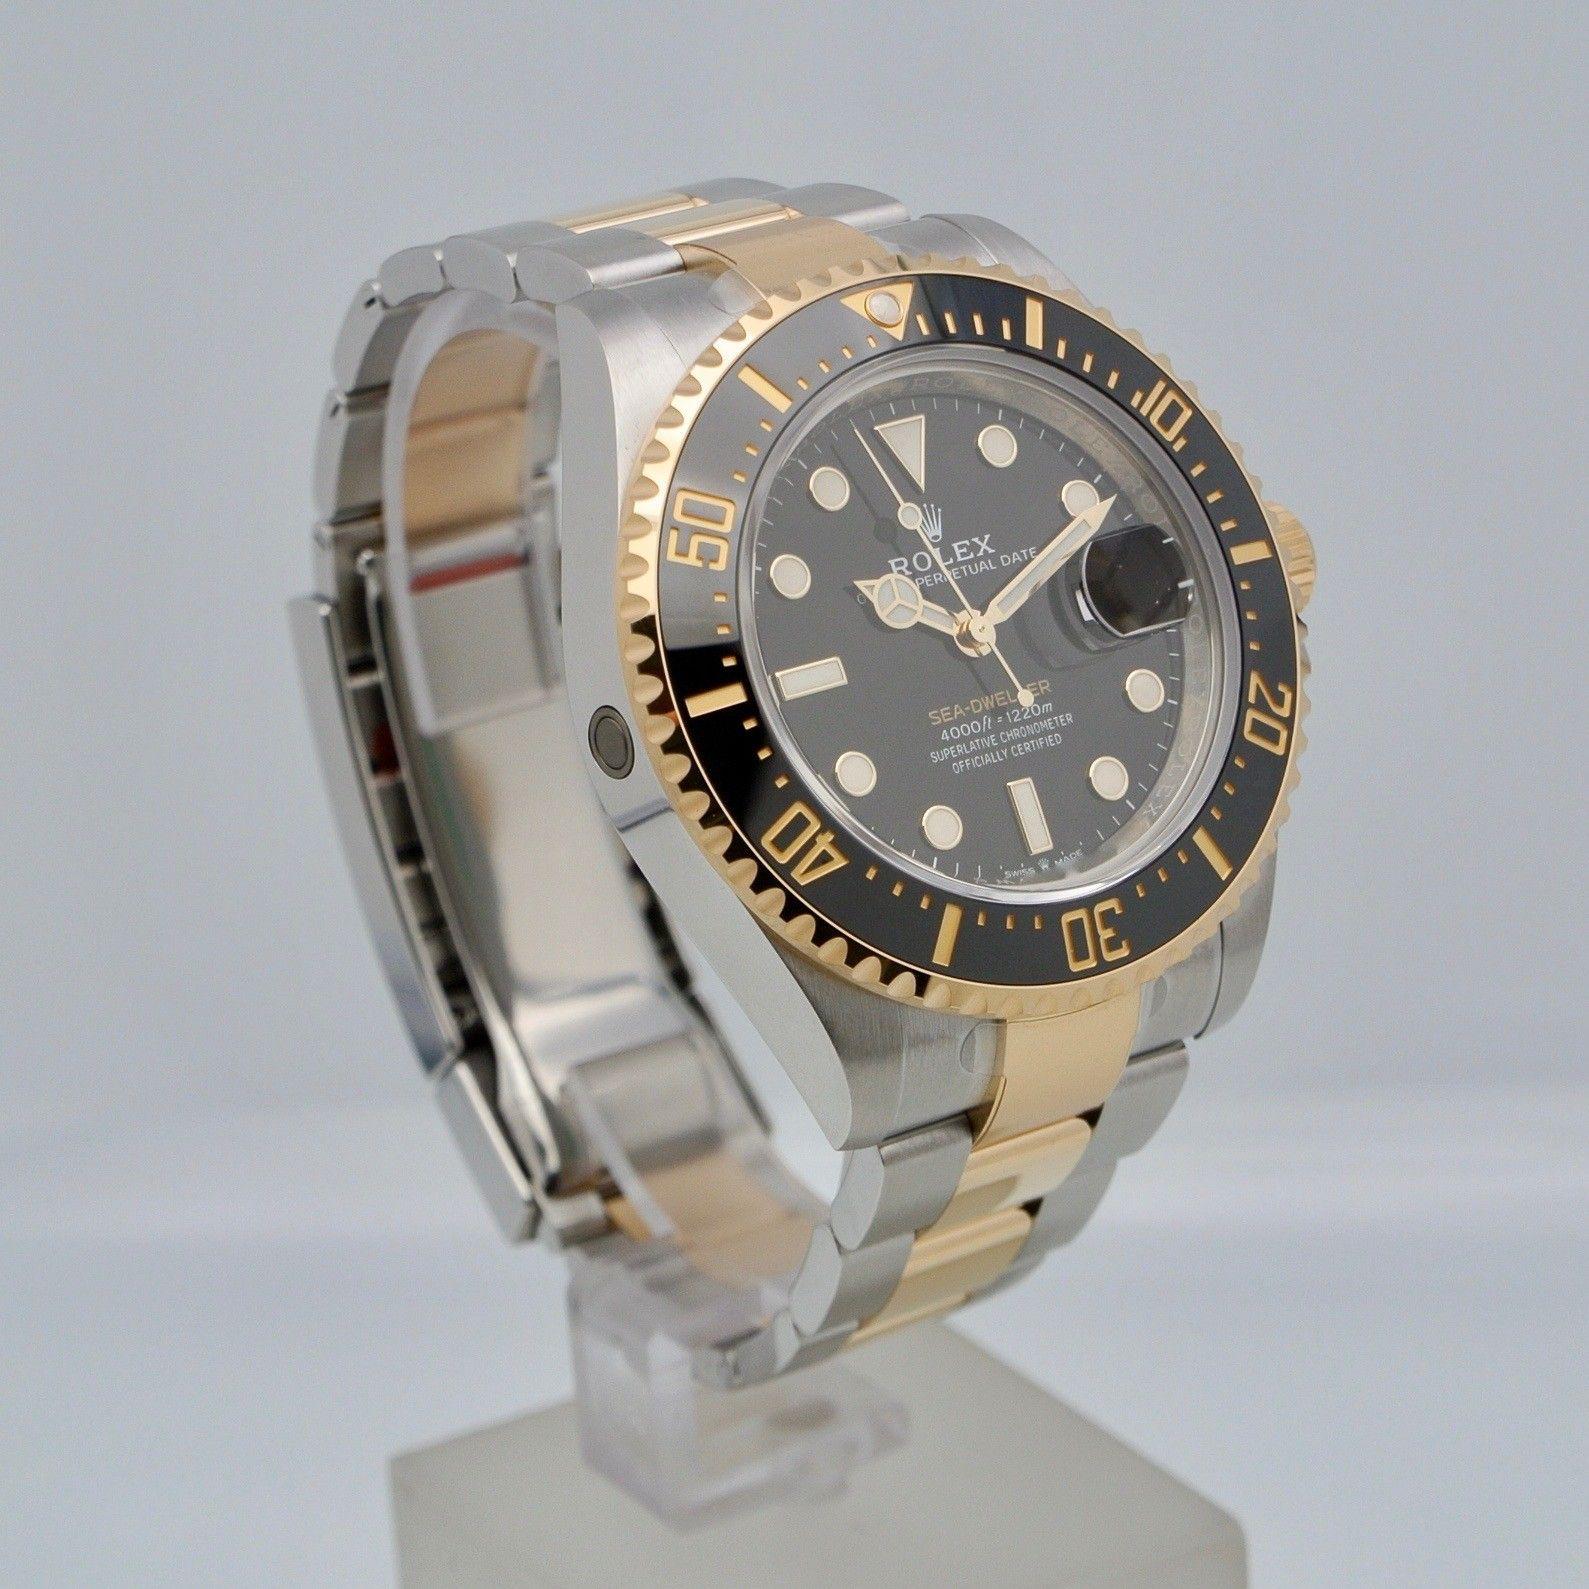 Rolex Sea-Dweller steel/gold